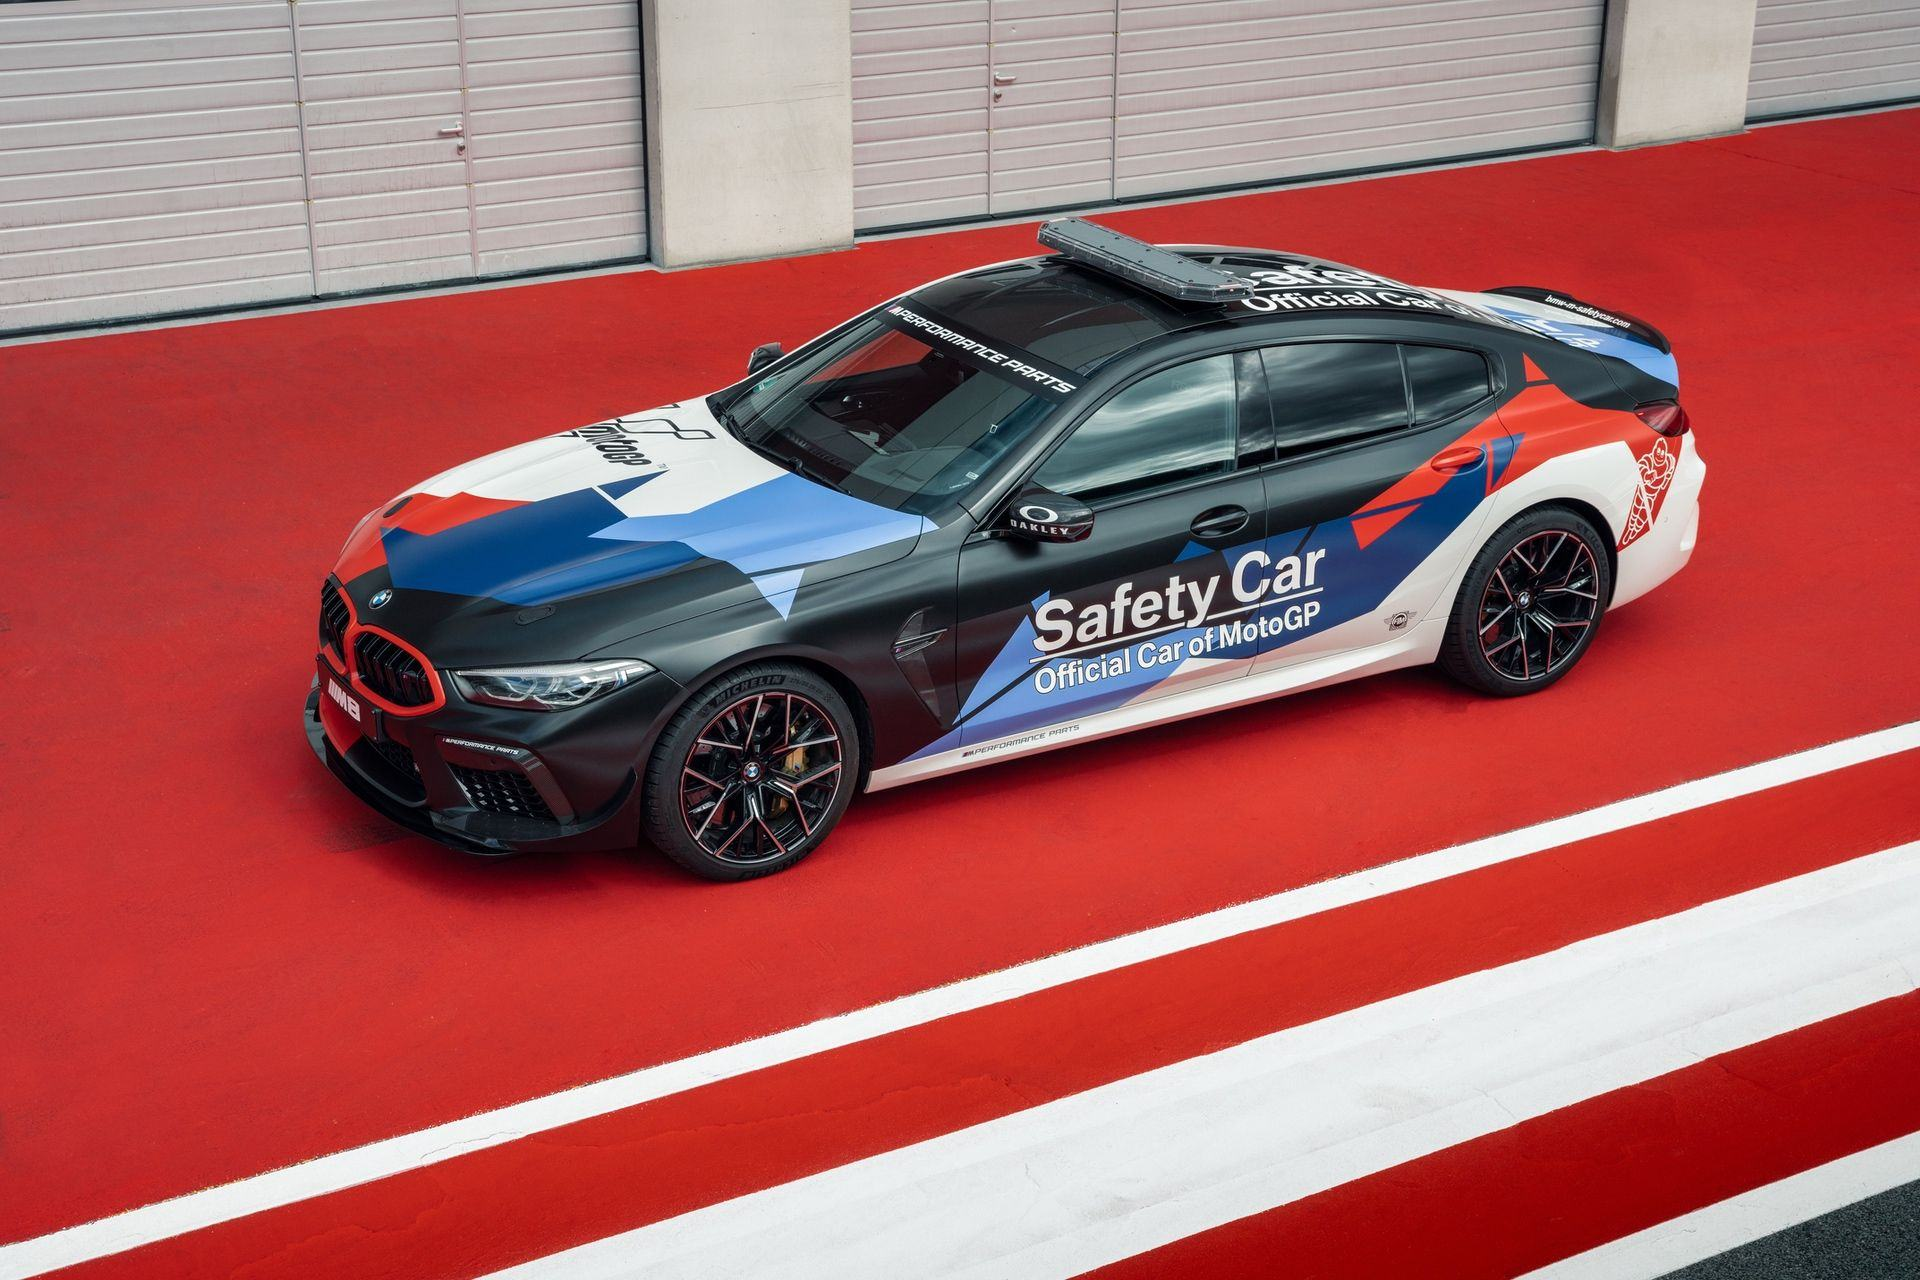 BMW_M8_Gran_Coupe_Safety_Car_MotoGP_0008